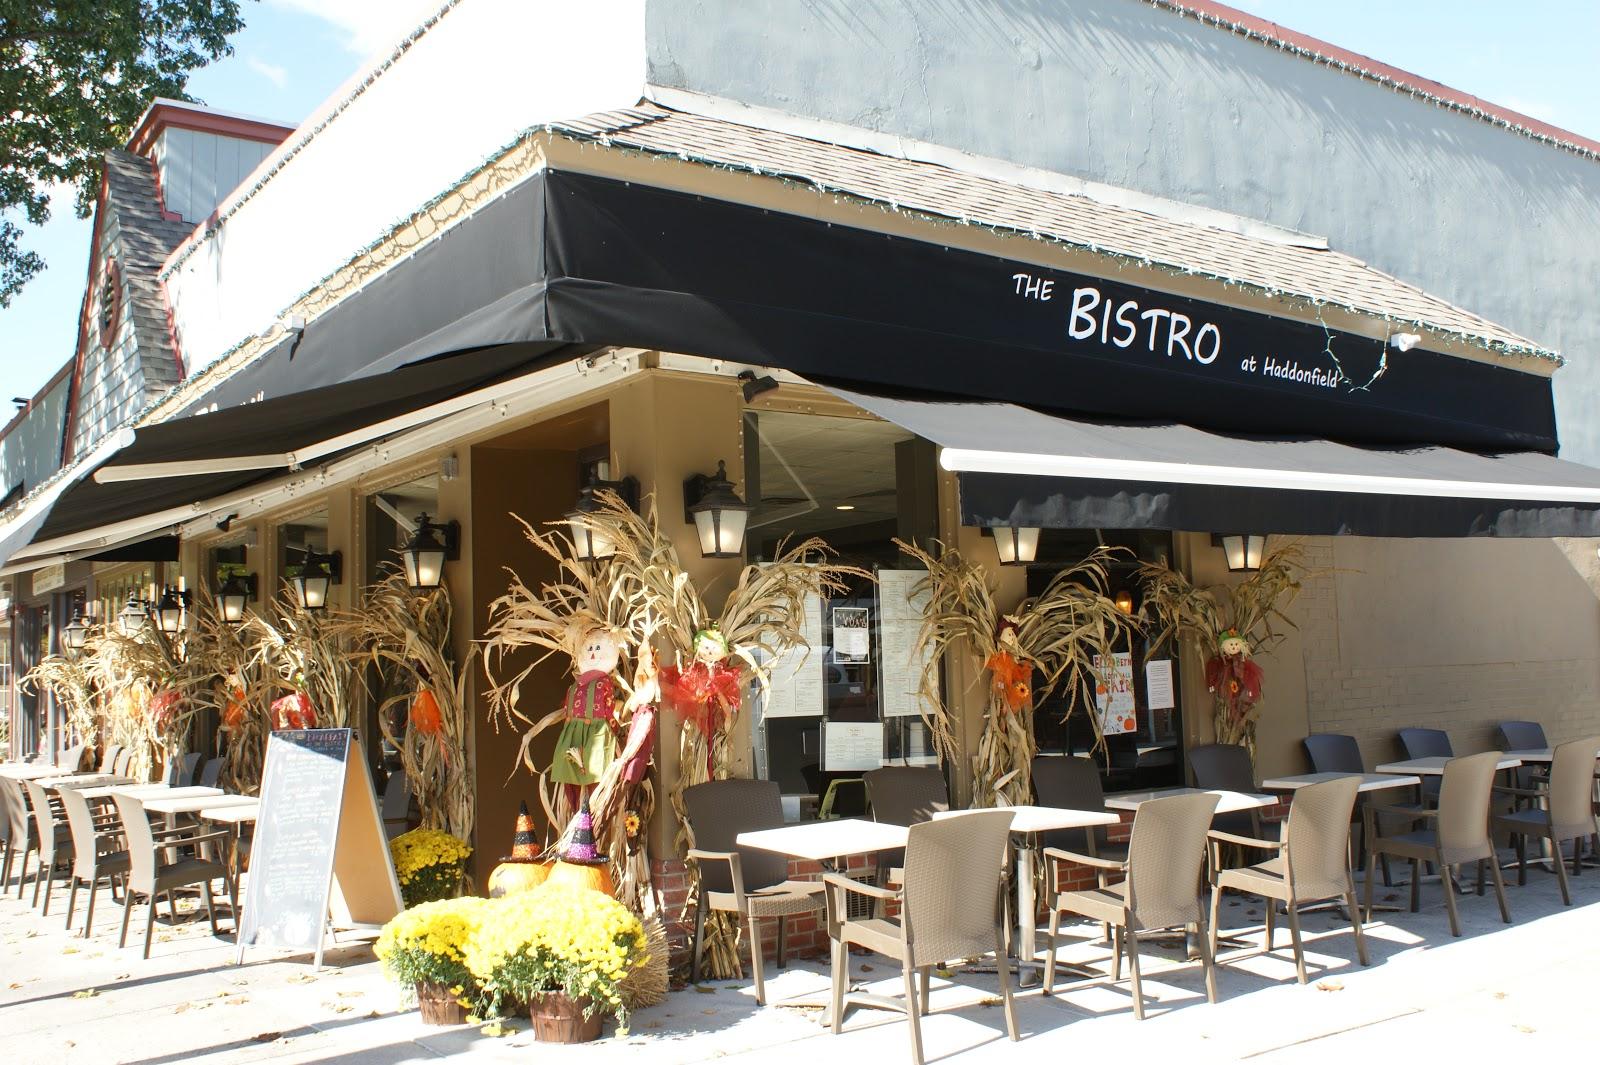 New Restaurants In Haddonfield Nj